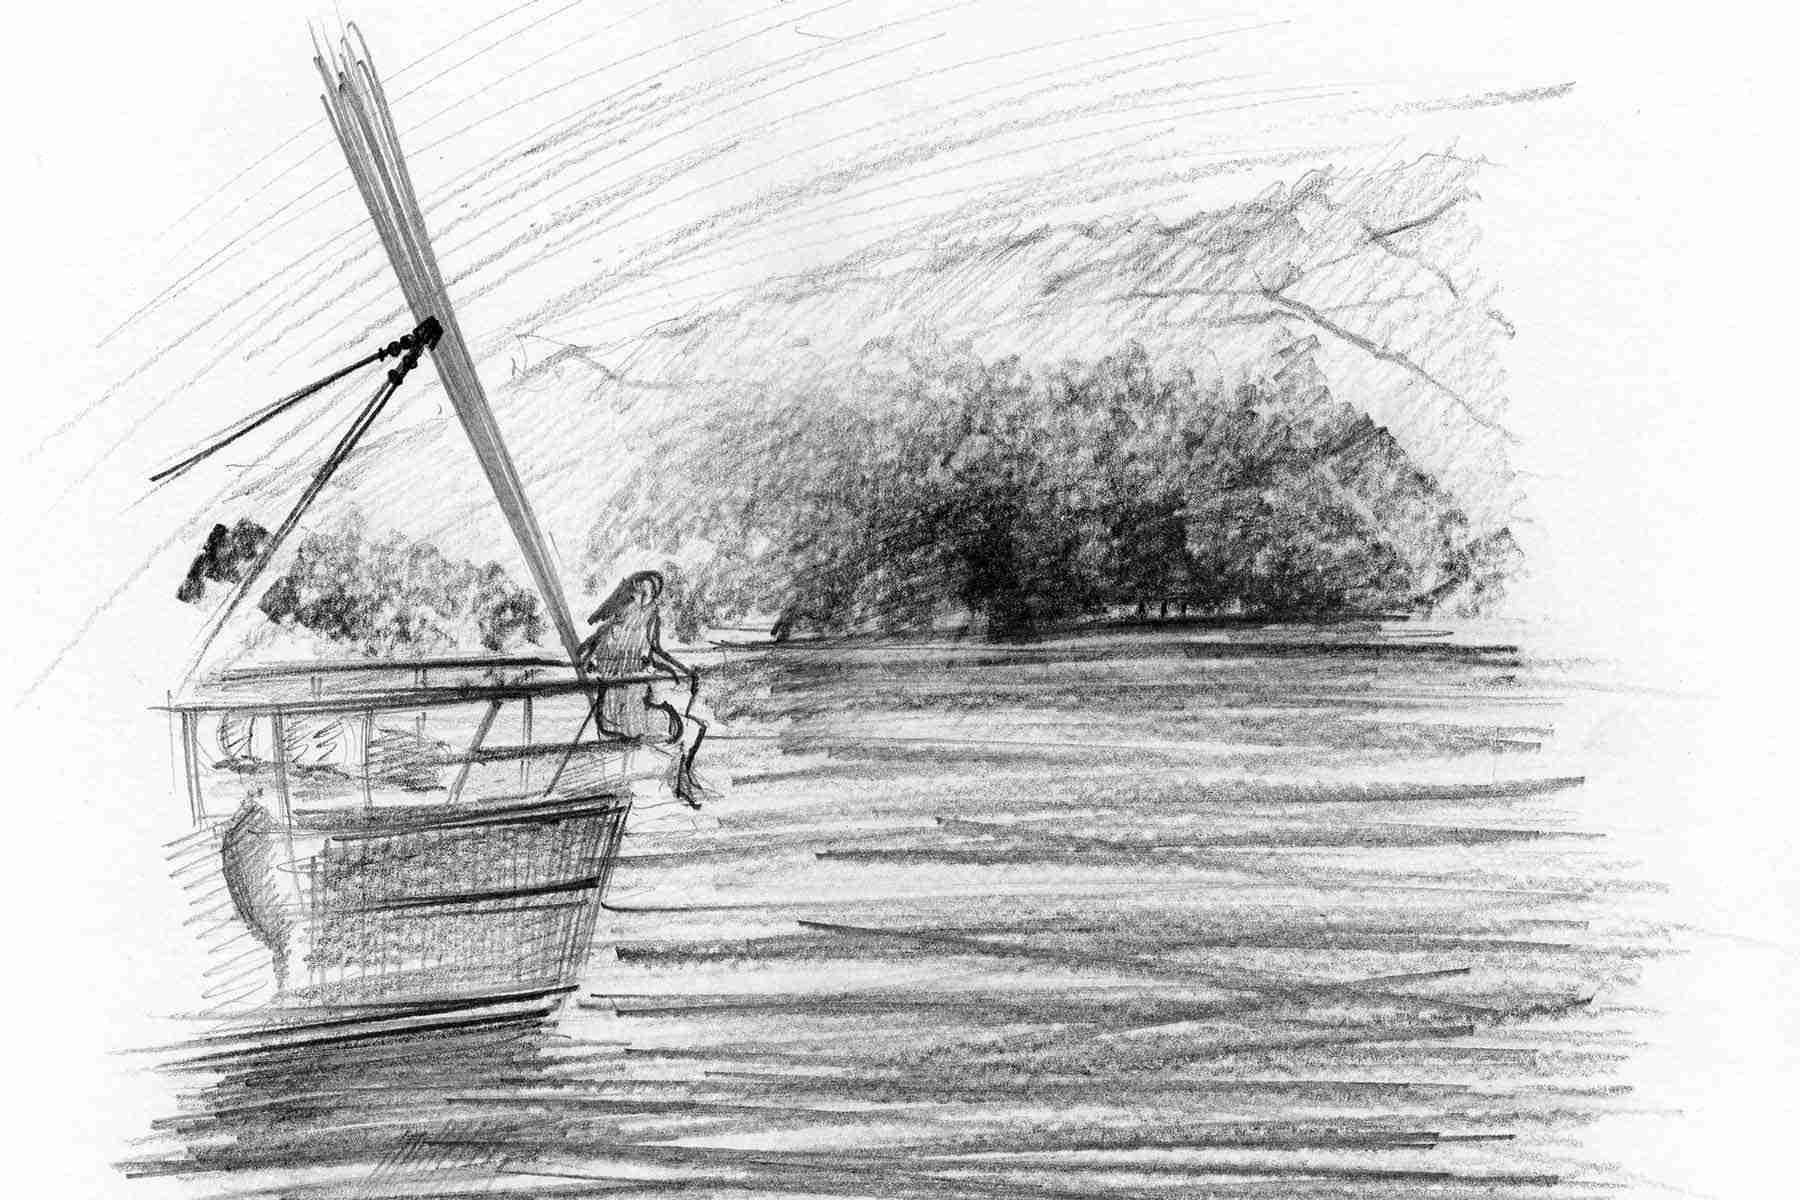 A lake scene.